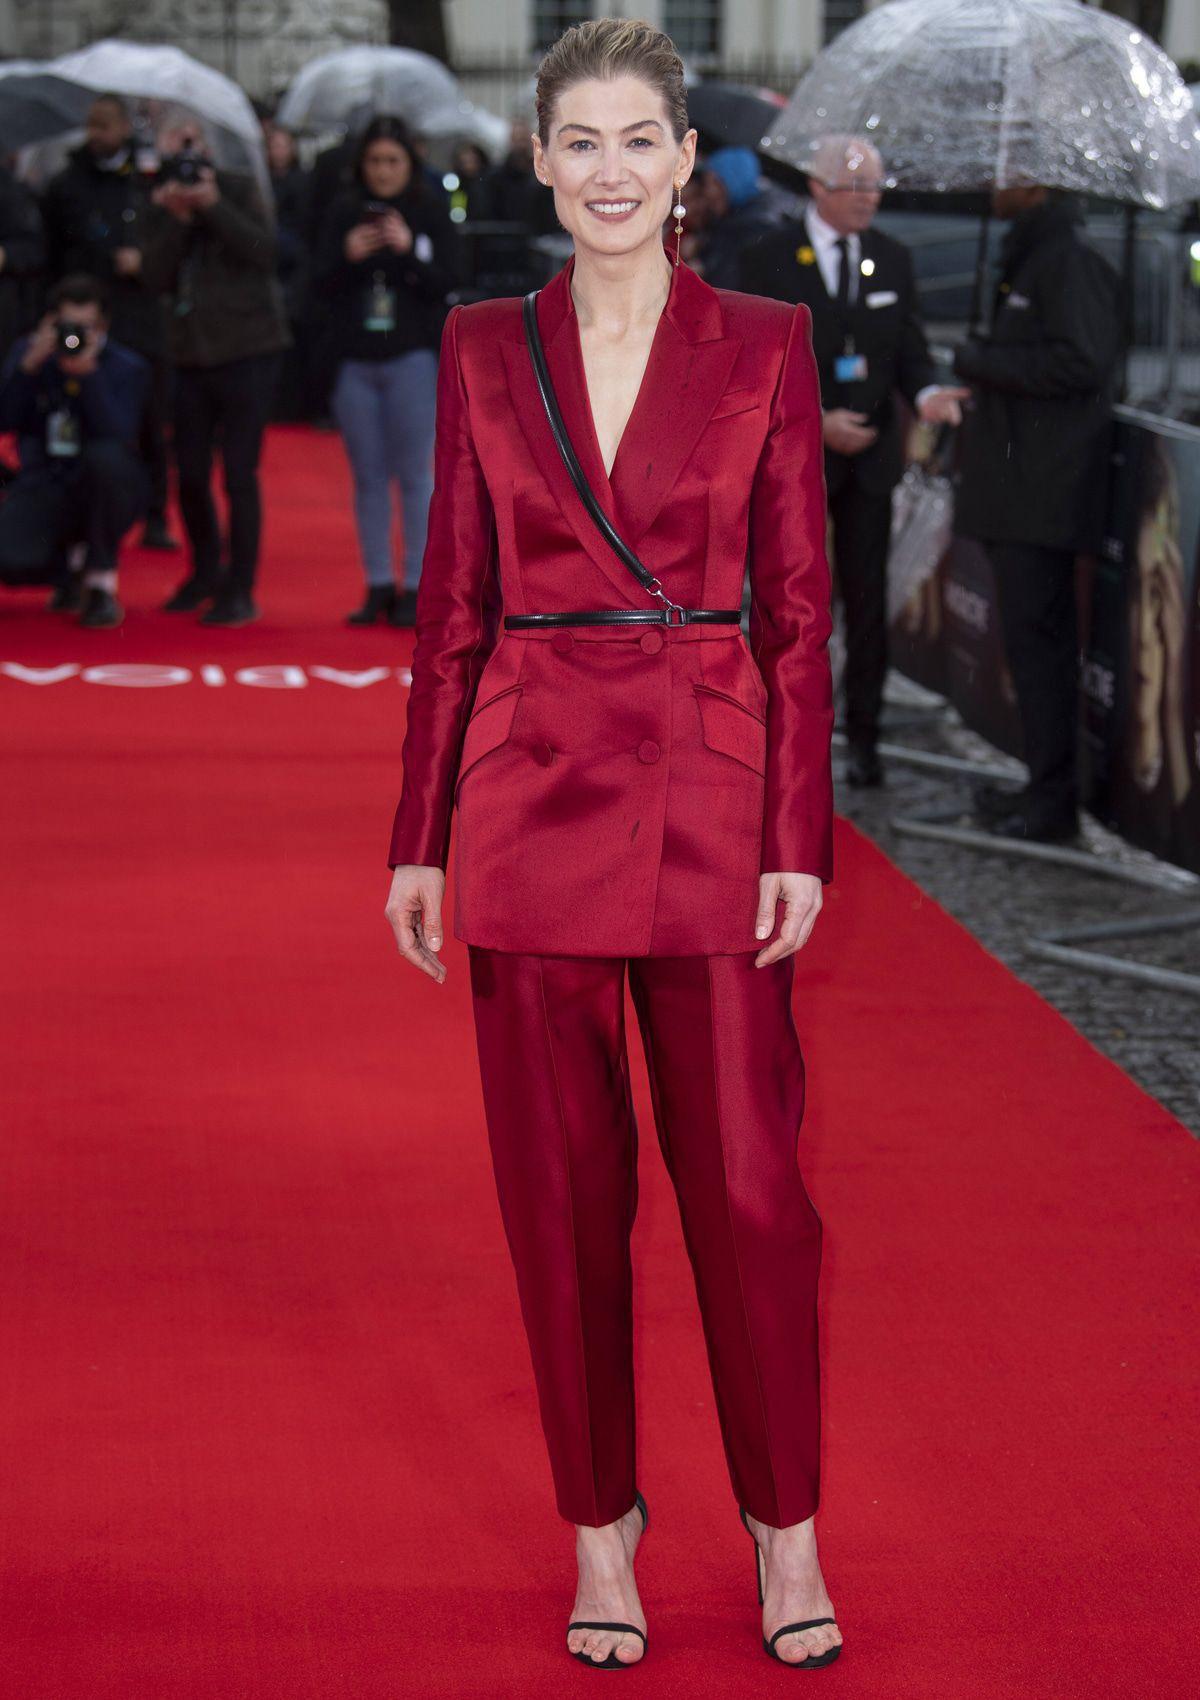 Best Dress of the Day (868): Rosamund Pike verzaubert in Rot